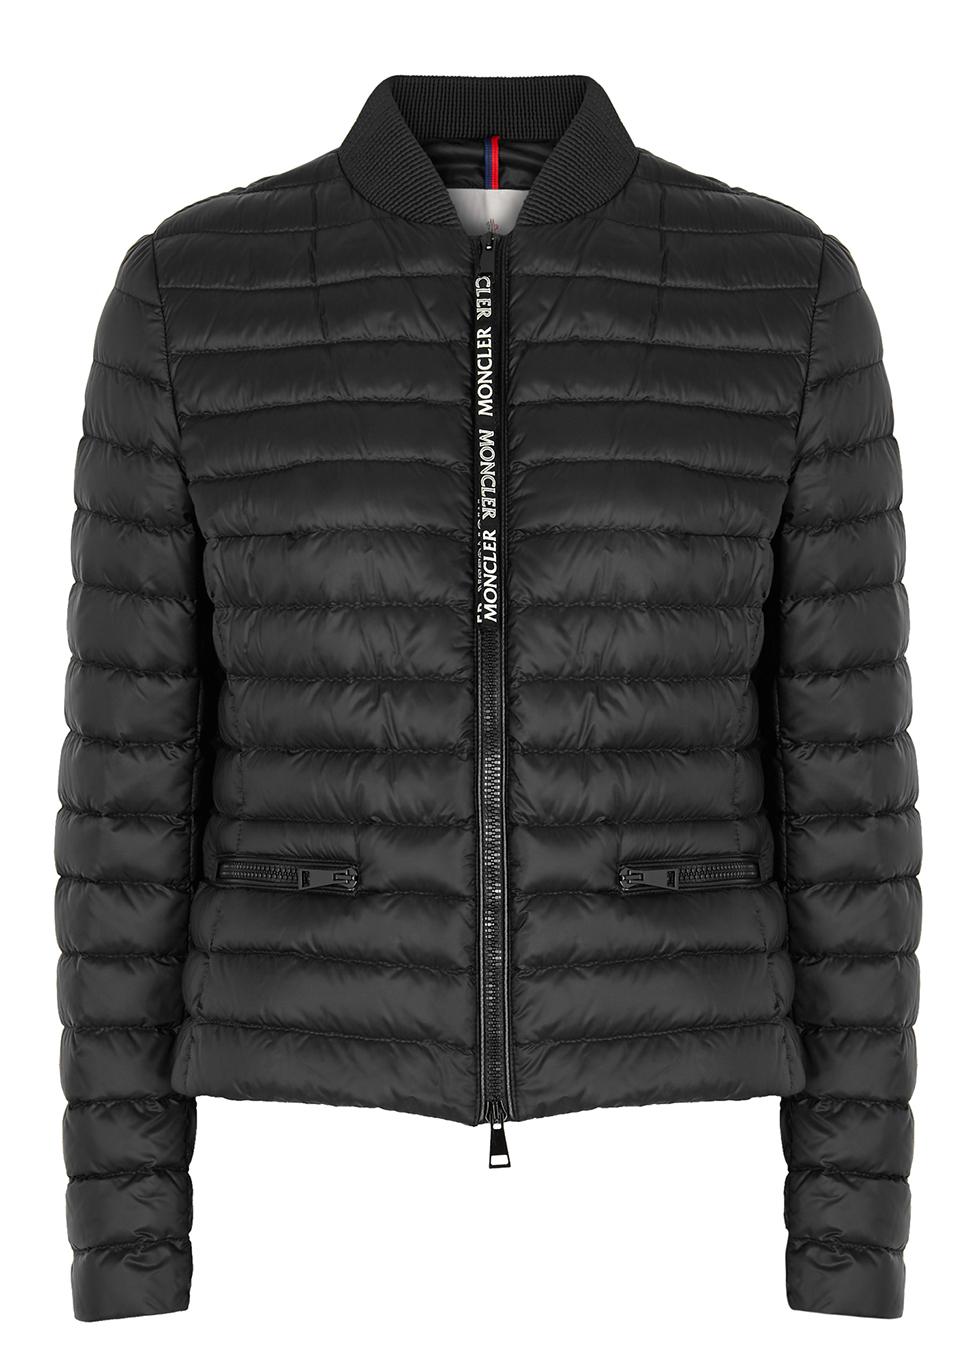 moncler designer jackets coats gilets harvey nichols rh harveynichols com